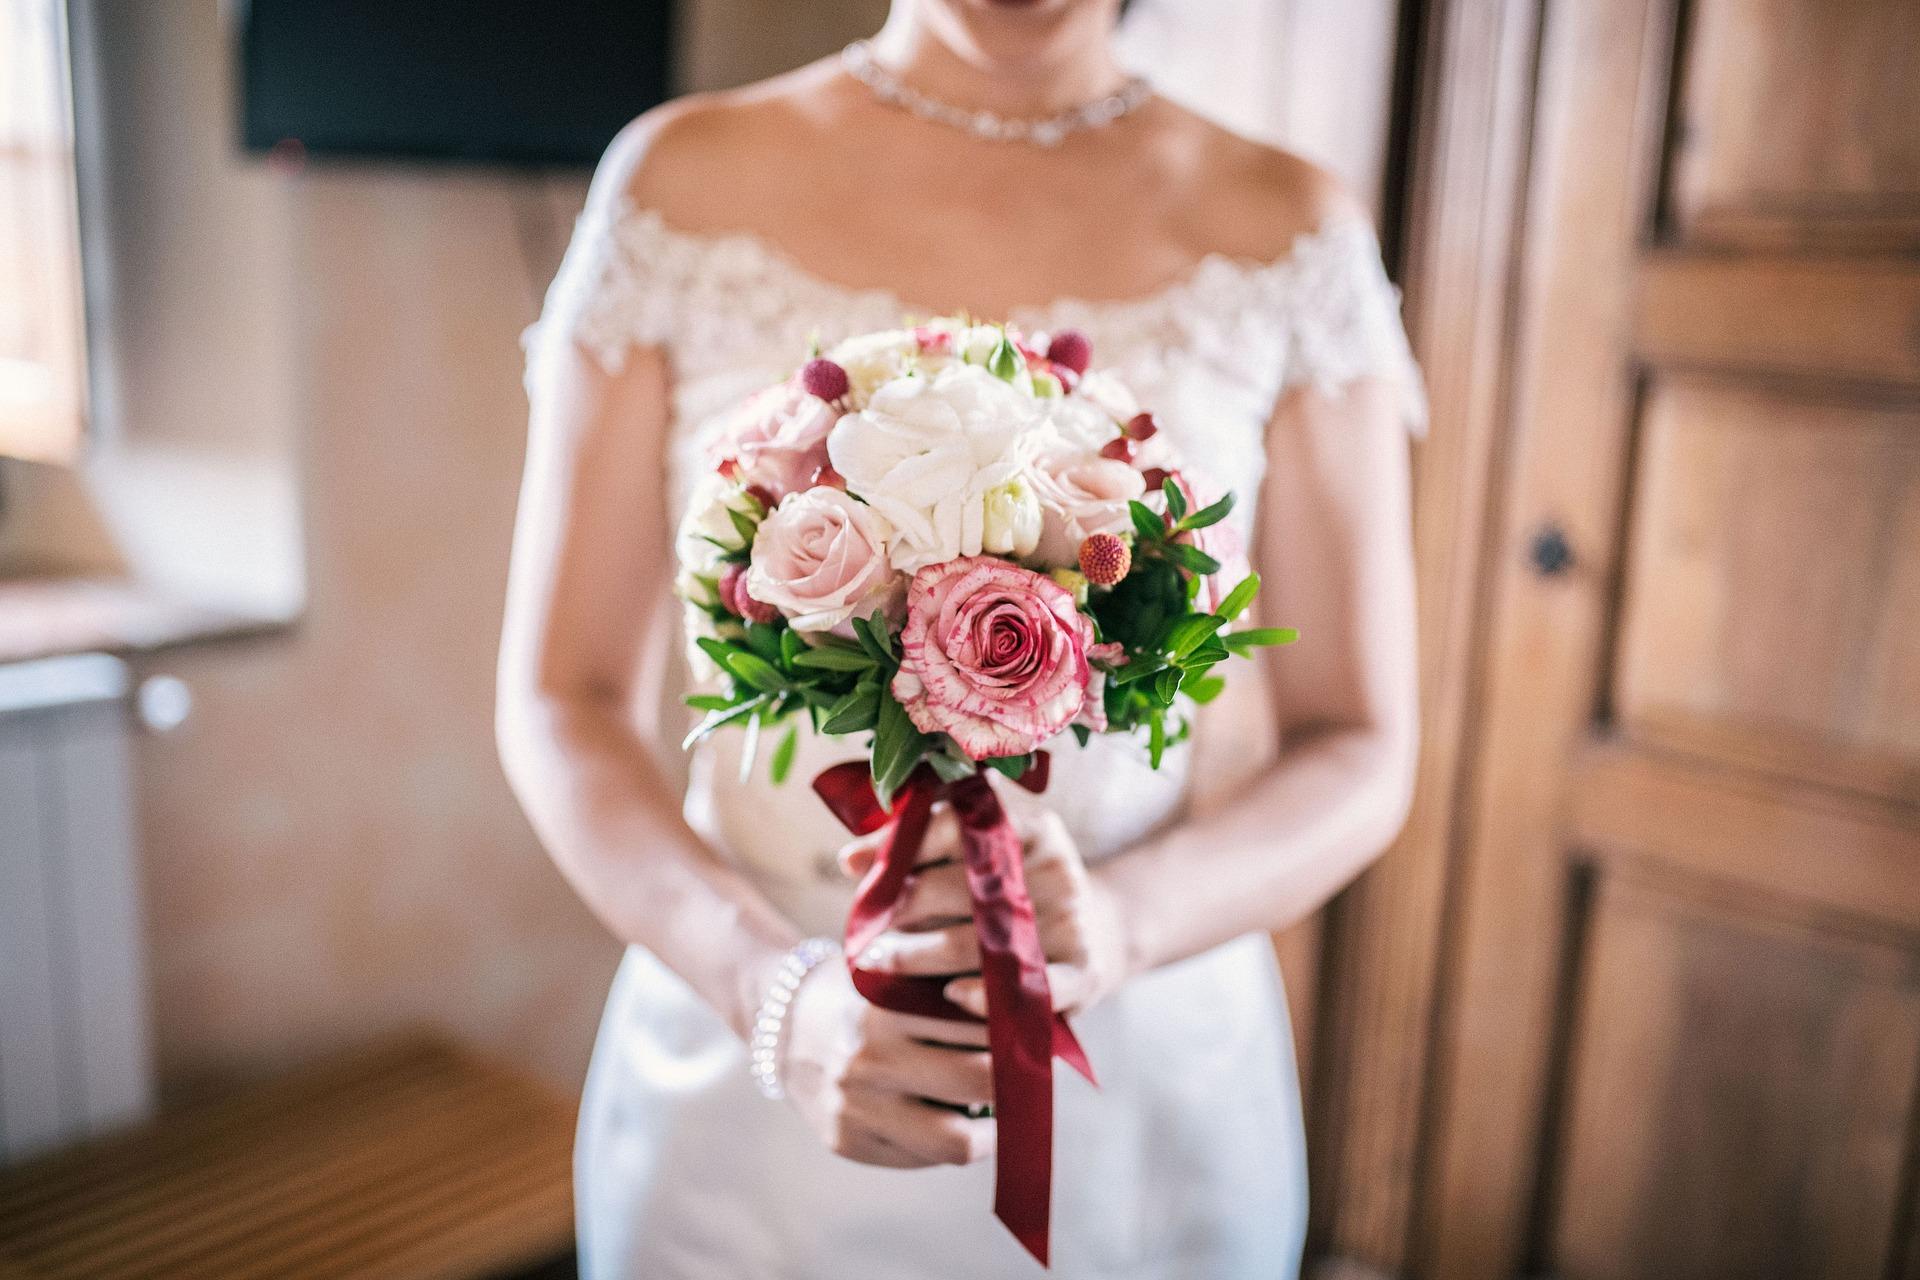 bridal-bouquet-3960220_1920.jpg